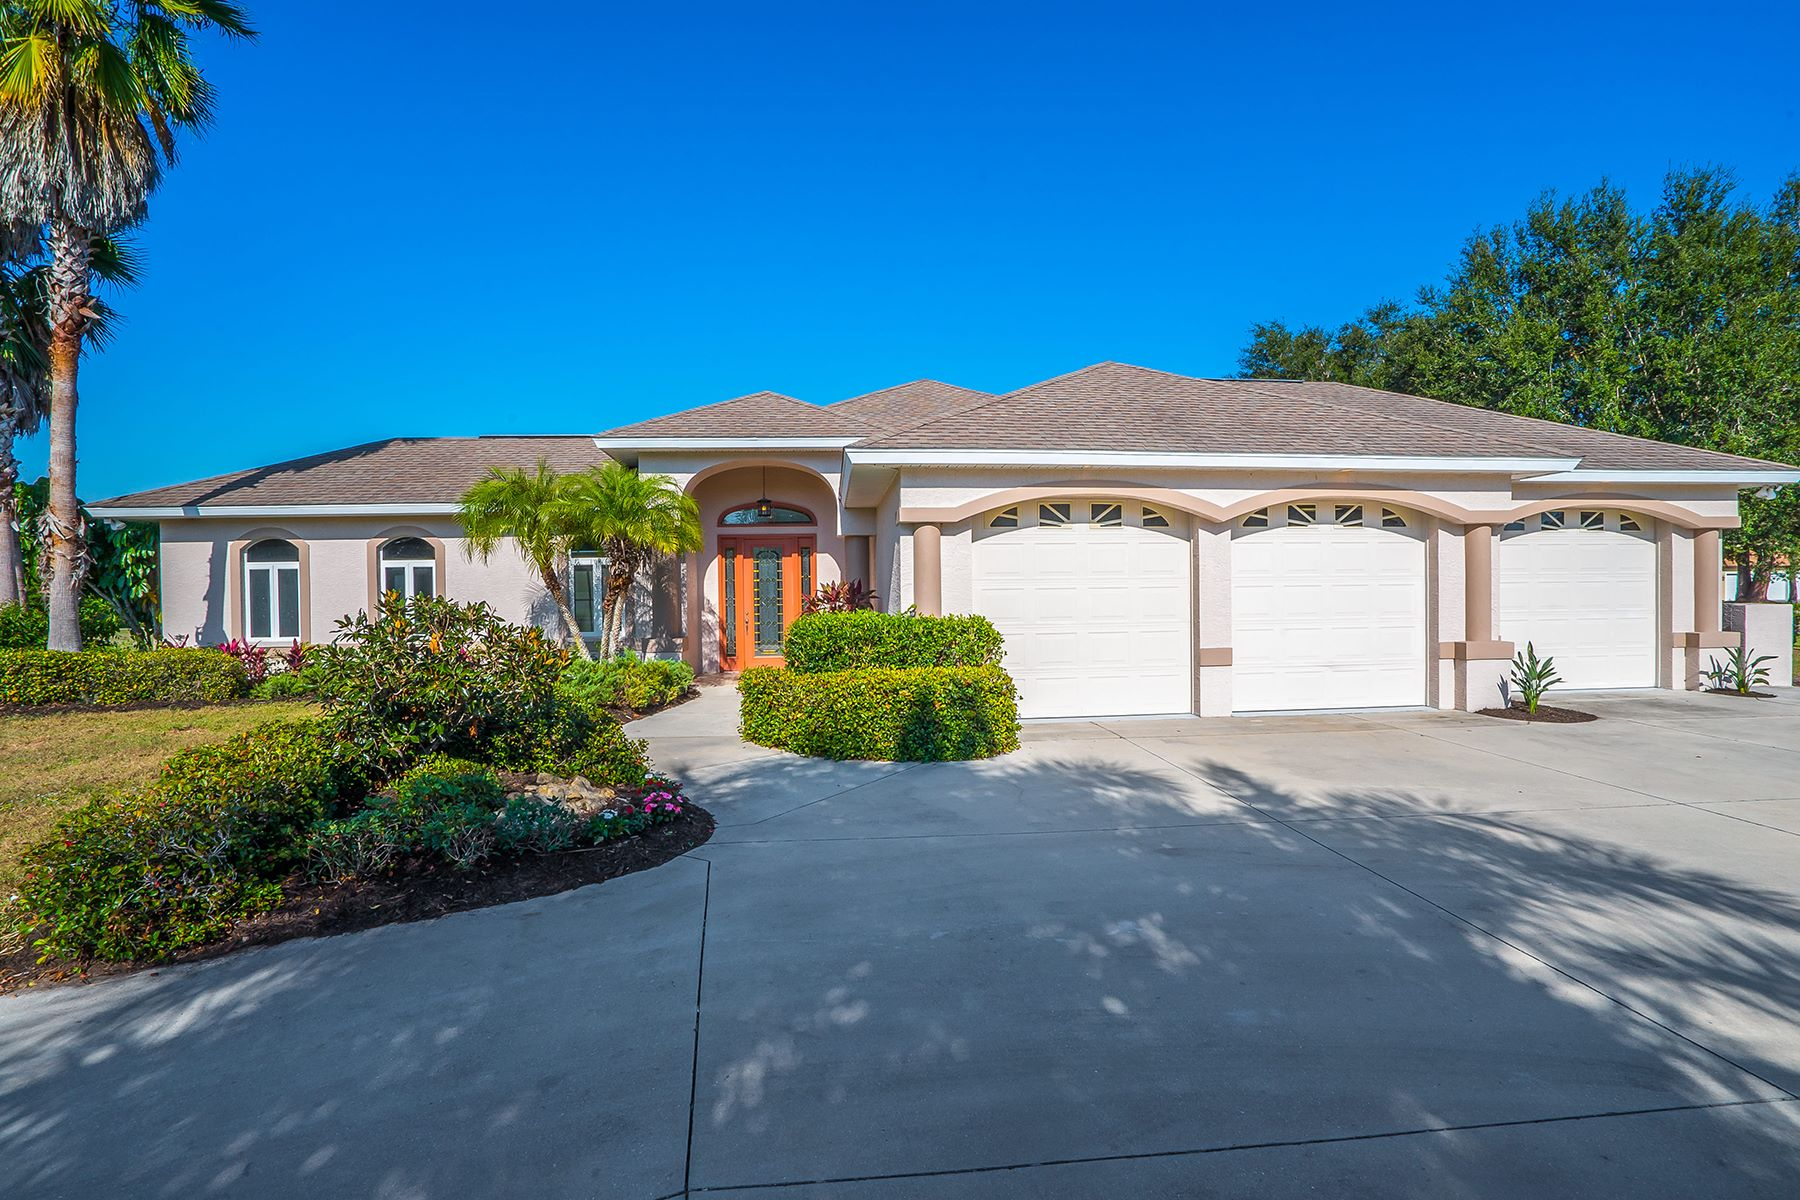 Single Family Home for Sale at MISSION VALLEY ESTATES 799 Capistrano Dr Nokomis, Florida, 34275 United States